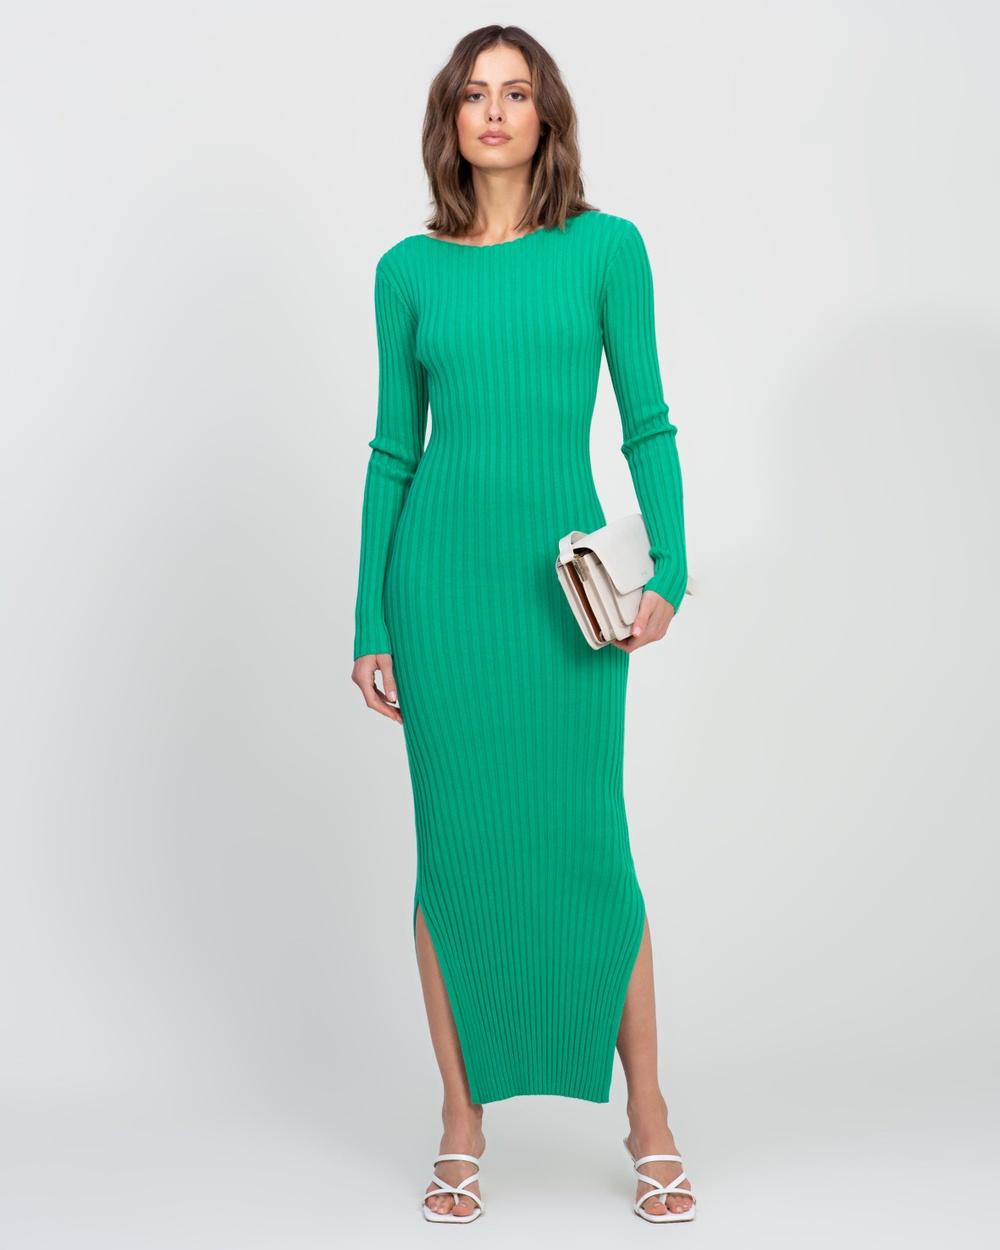 AERE Organic Cotton Blend Knit Dress Bodycon Dresses Jade Green